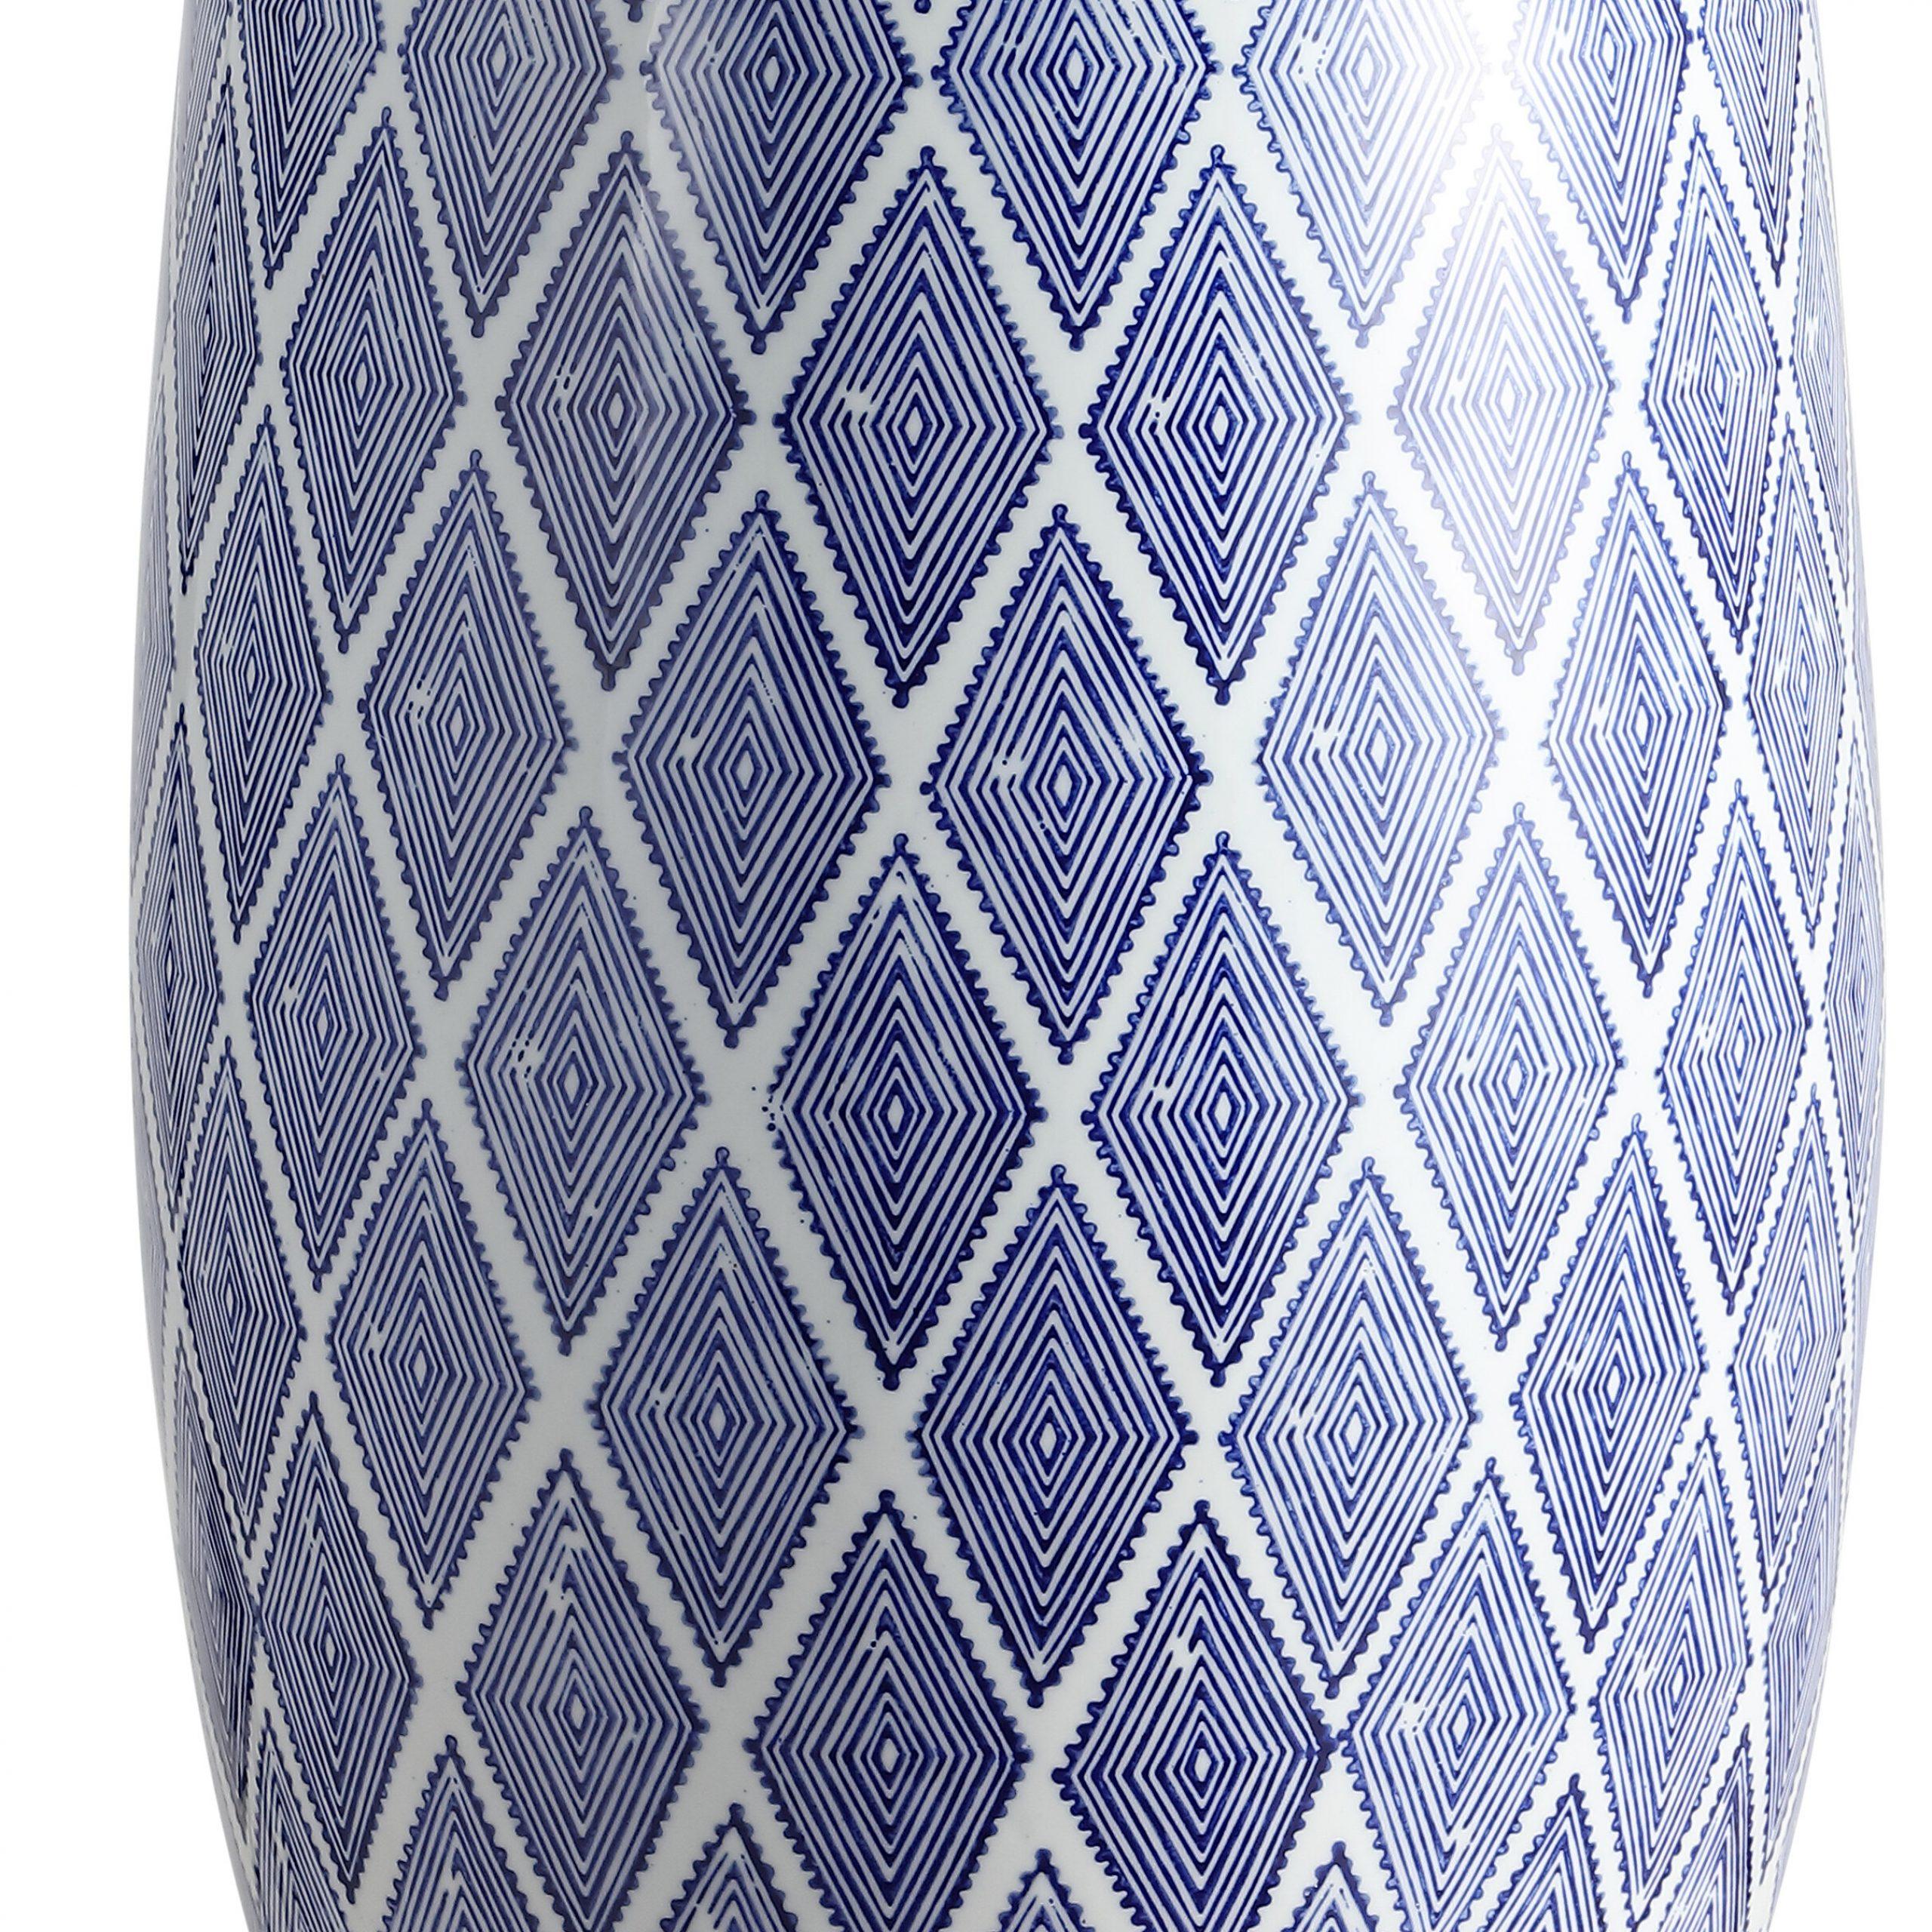 Ernst Diamonds Ceramic Drum Garden Stool Regarding Winterview Garden Stools (View 14 of 25)